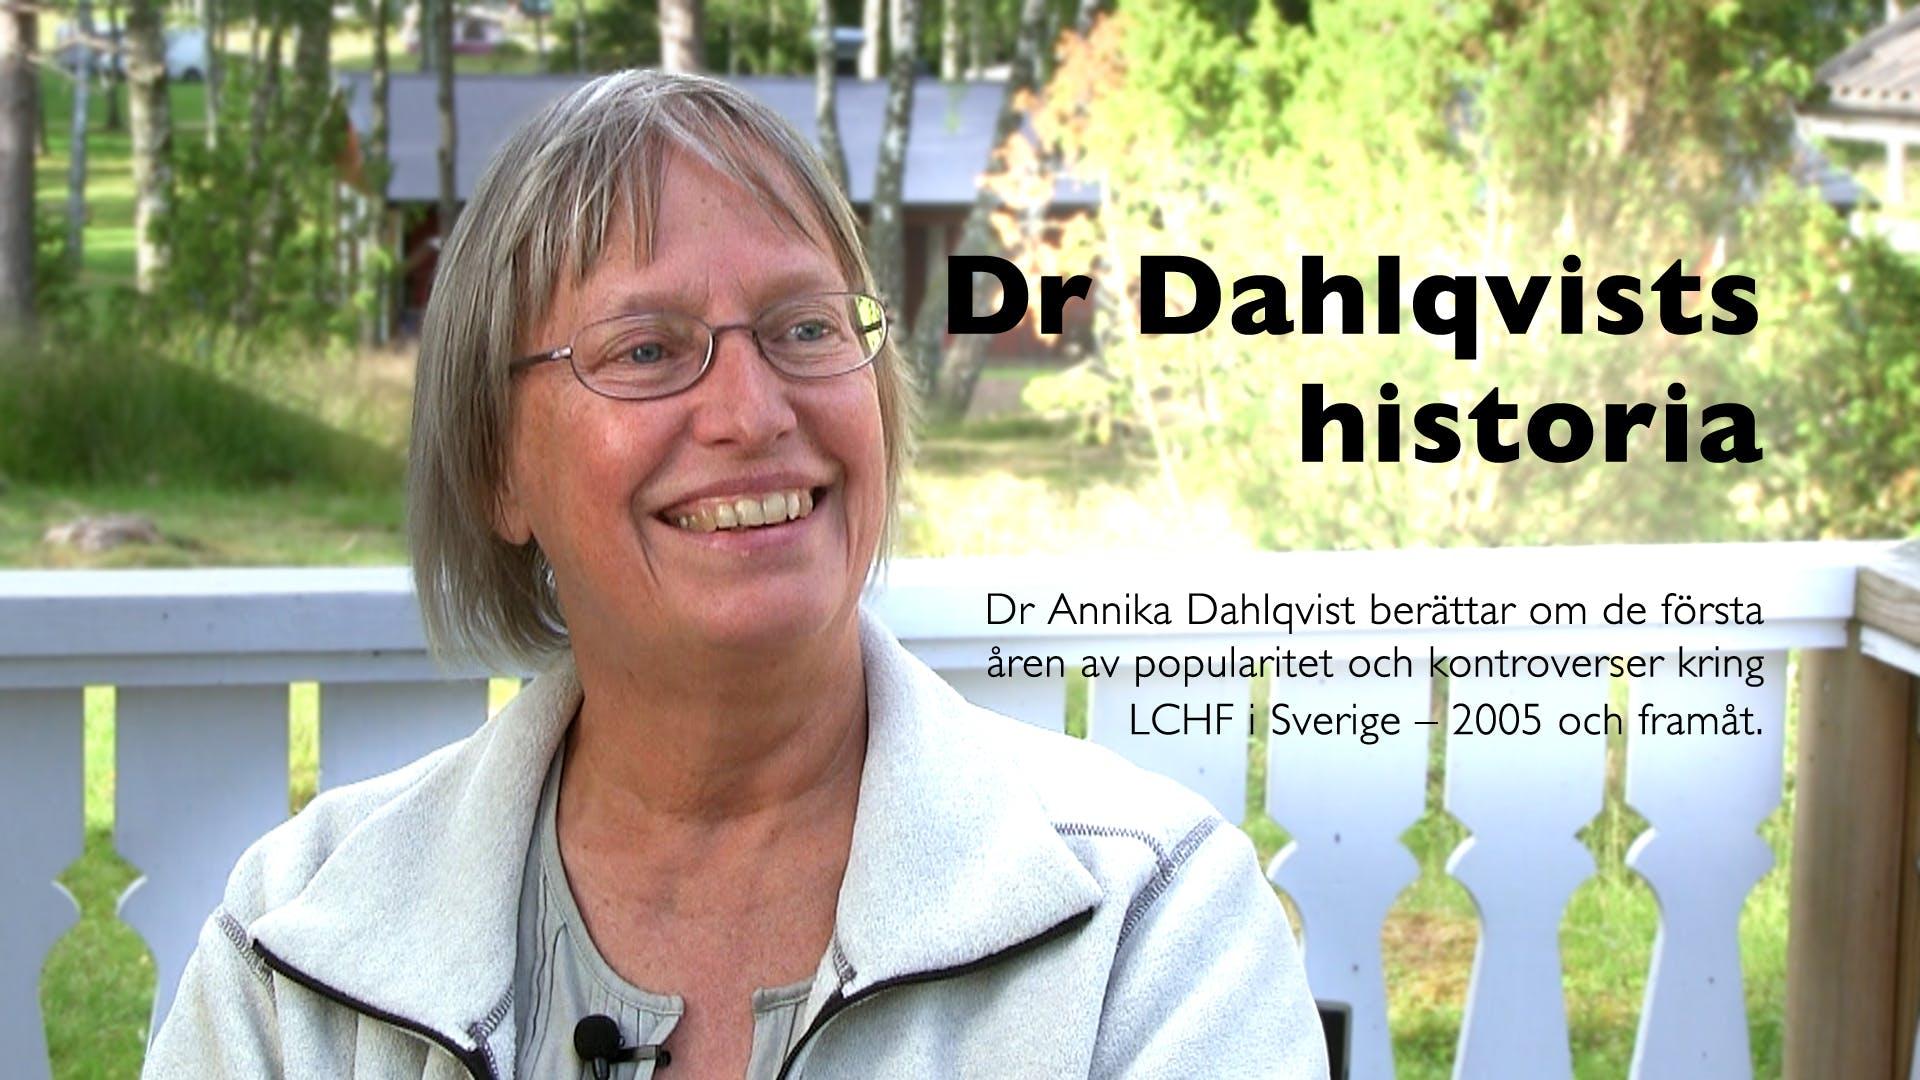 Dr Annika Dahlqvist